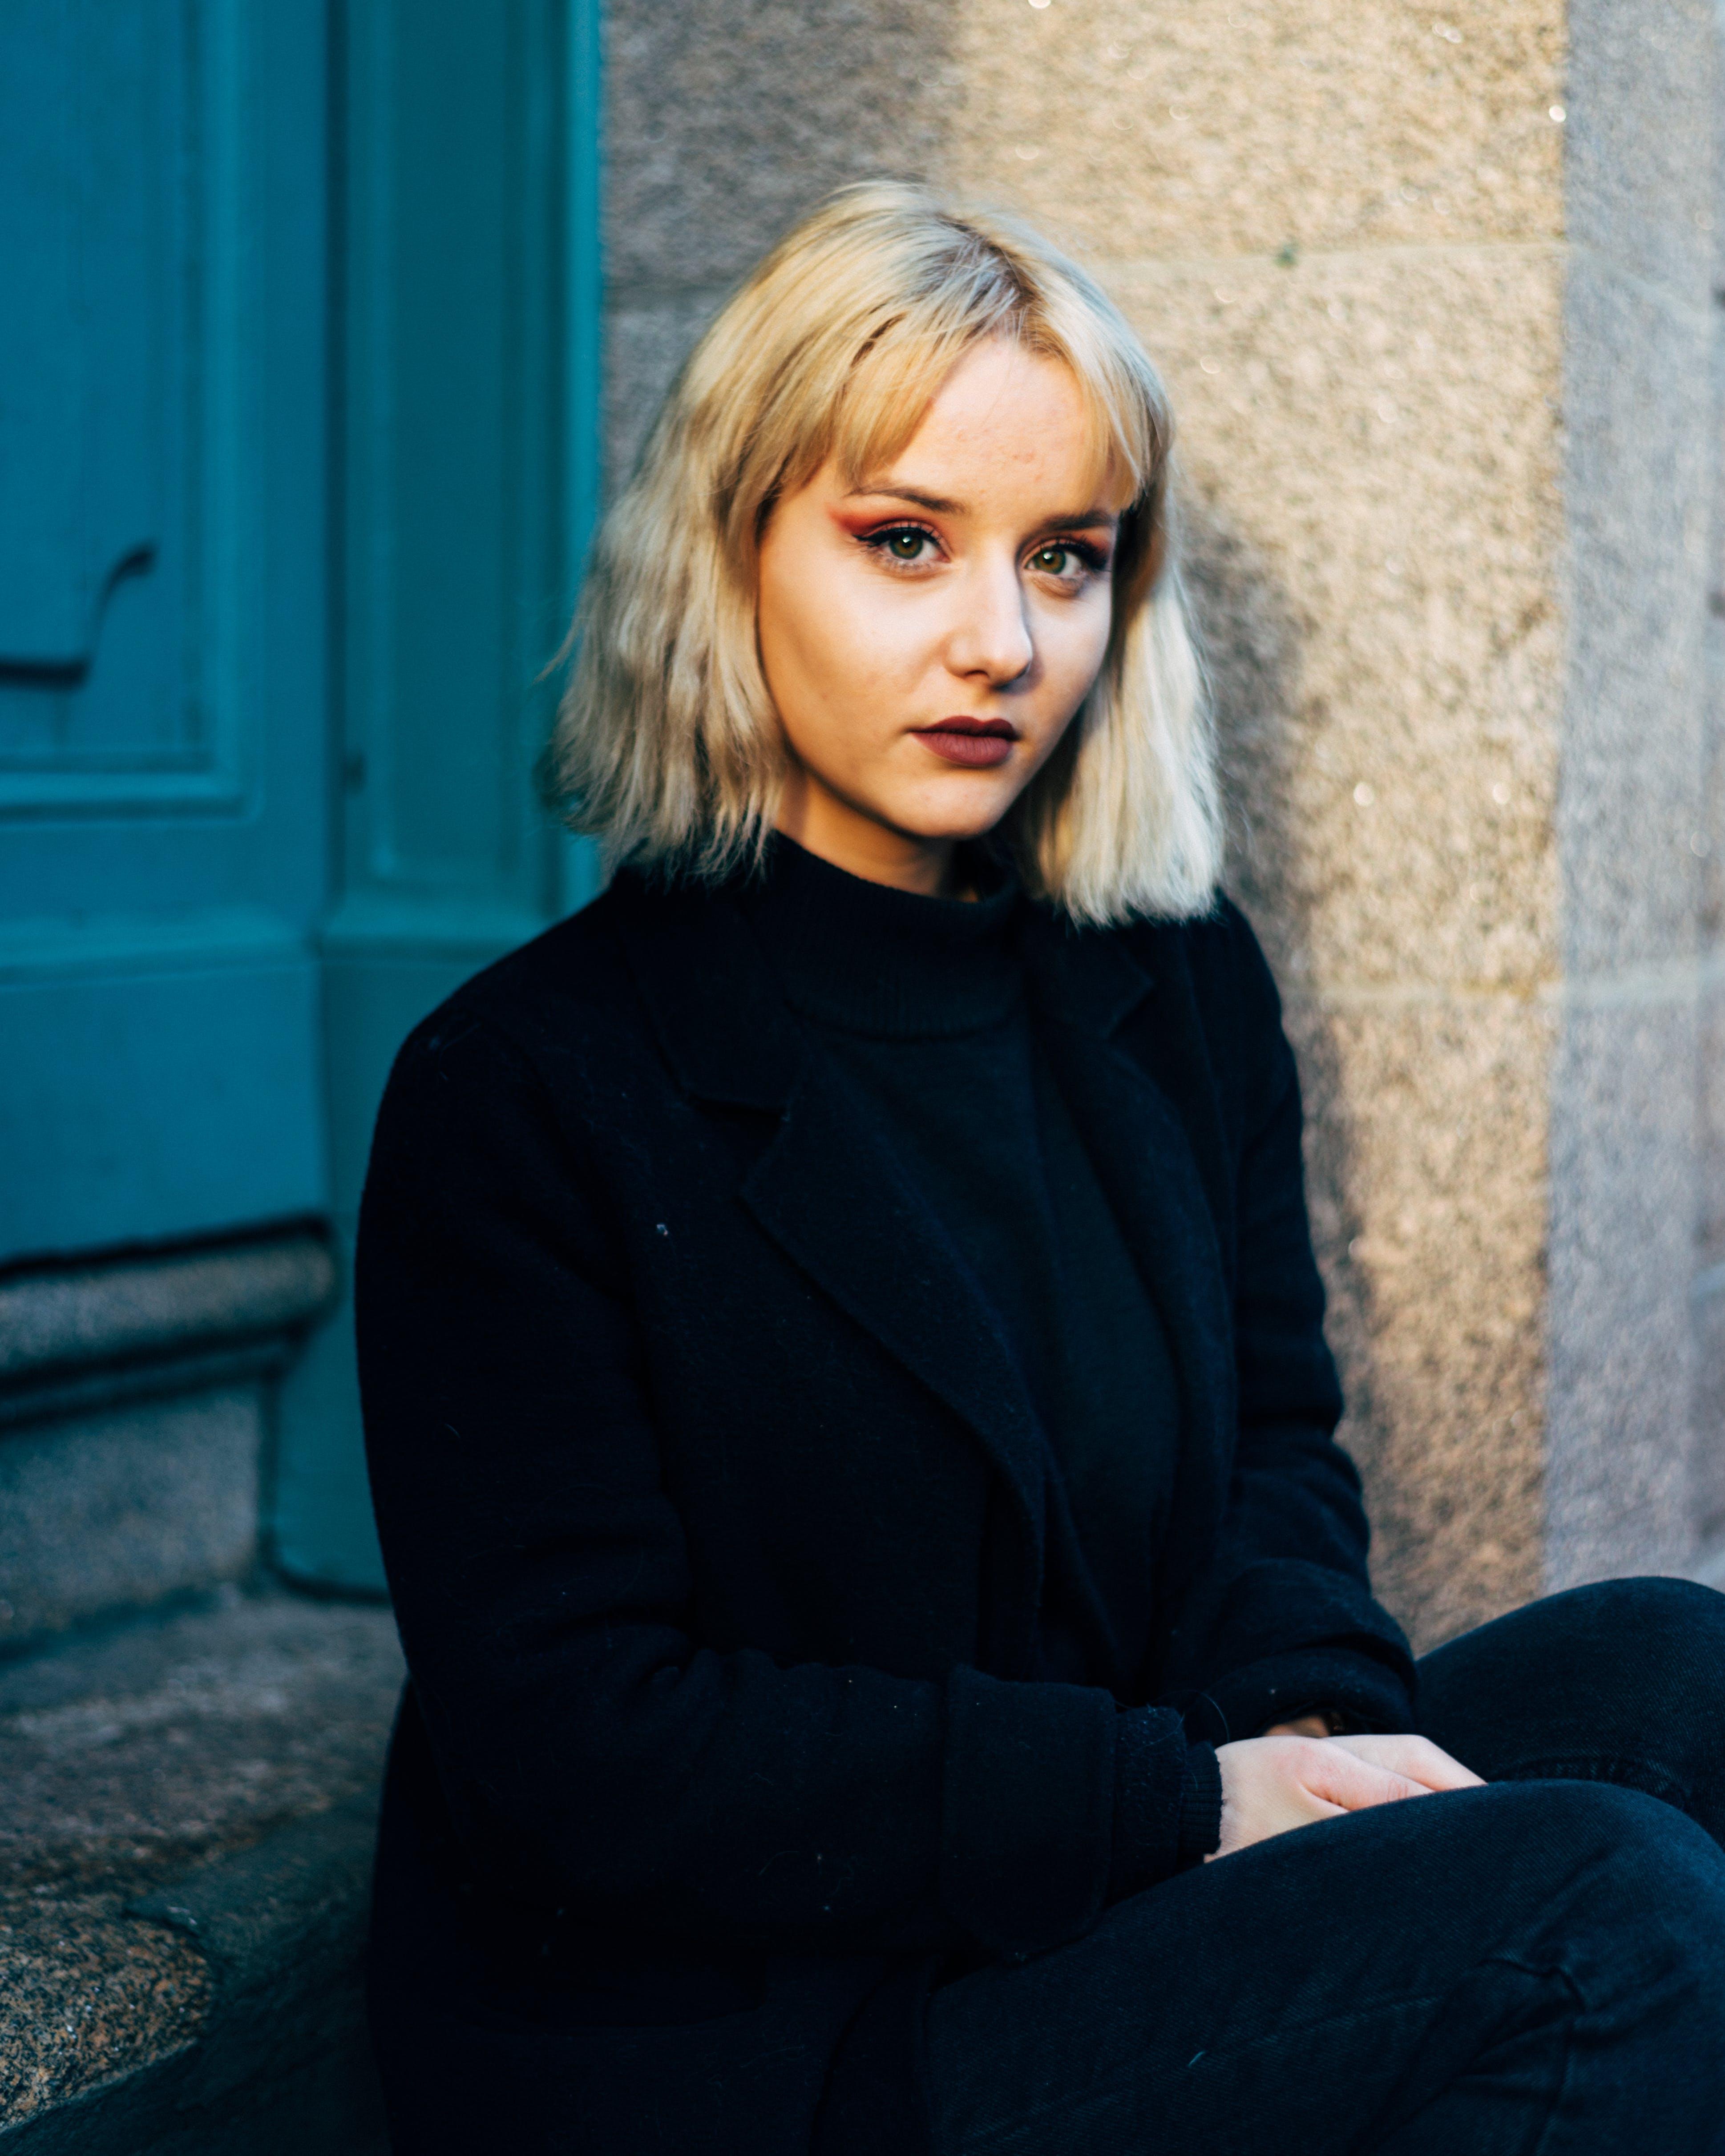 Безкоштовне стокове фото на тему «блондинка, вродлива, жінка, краса»